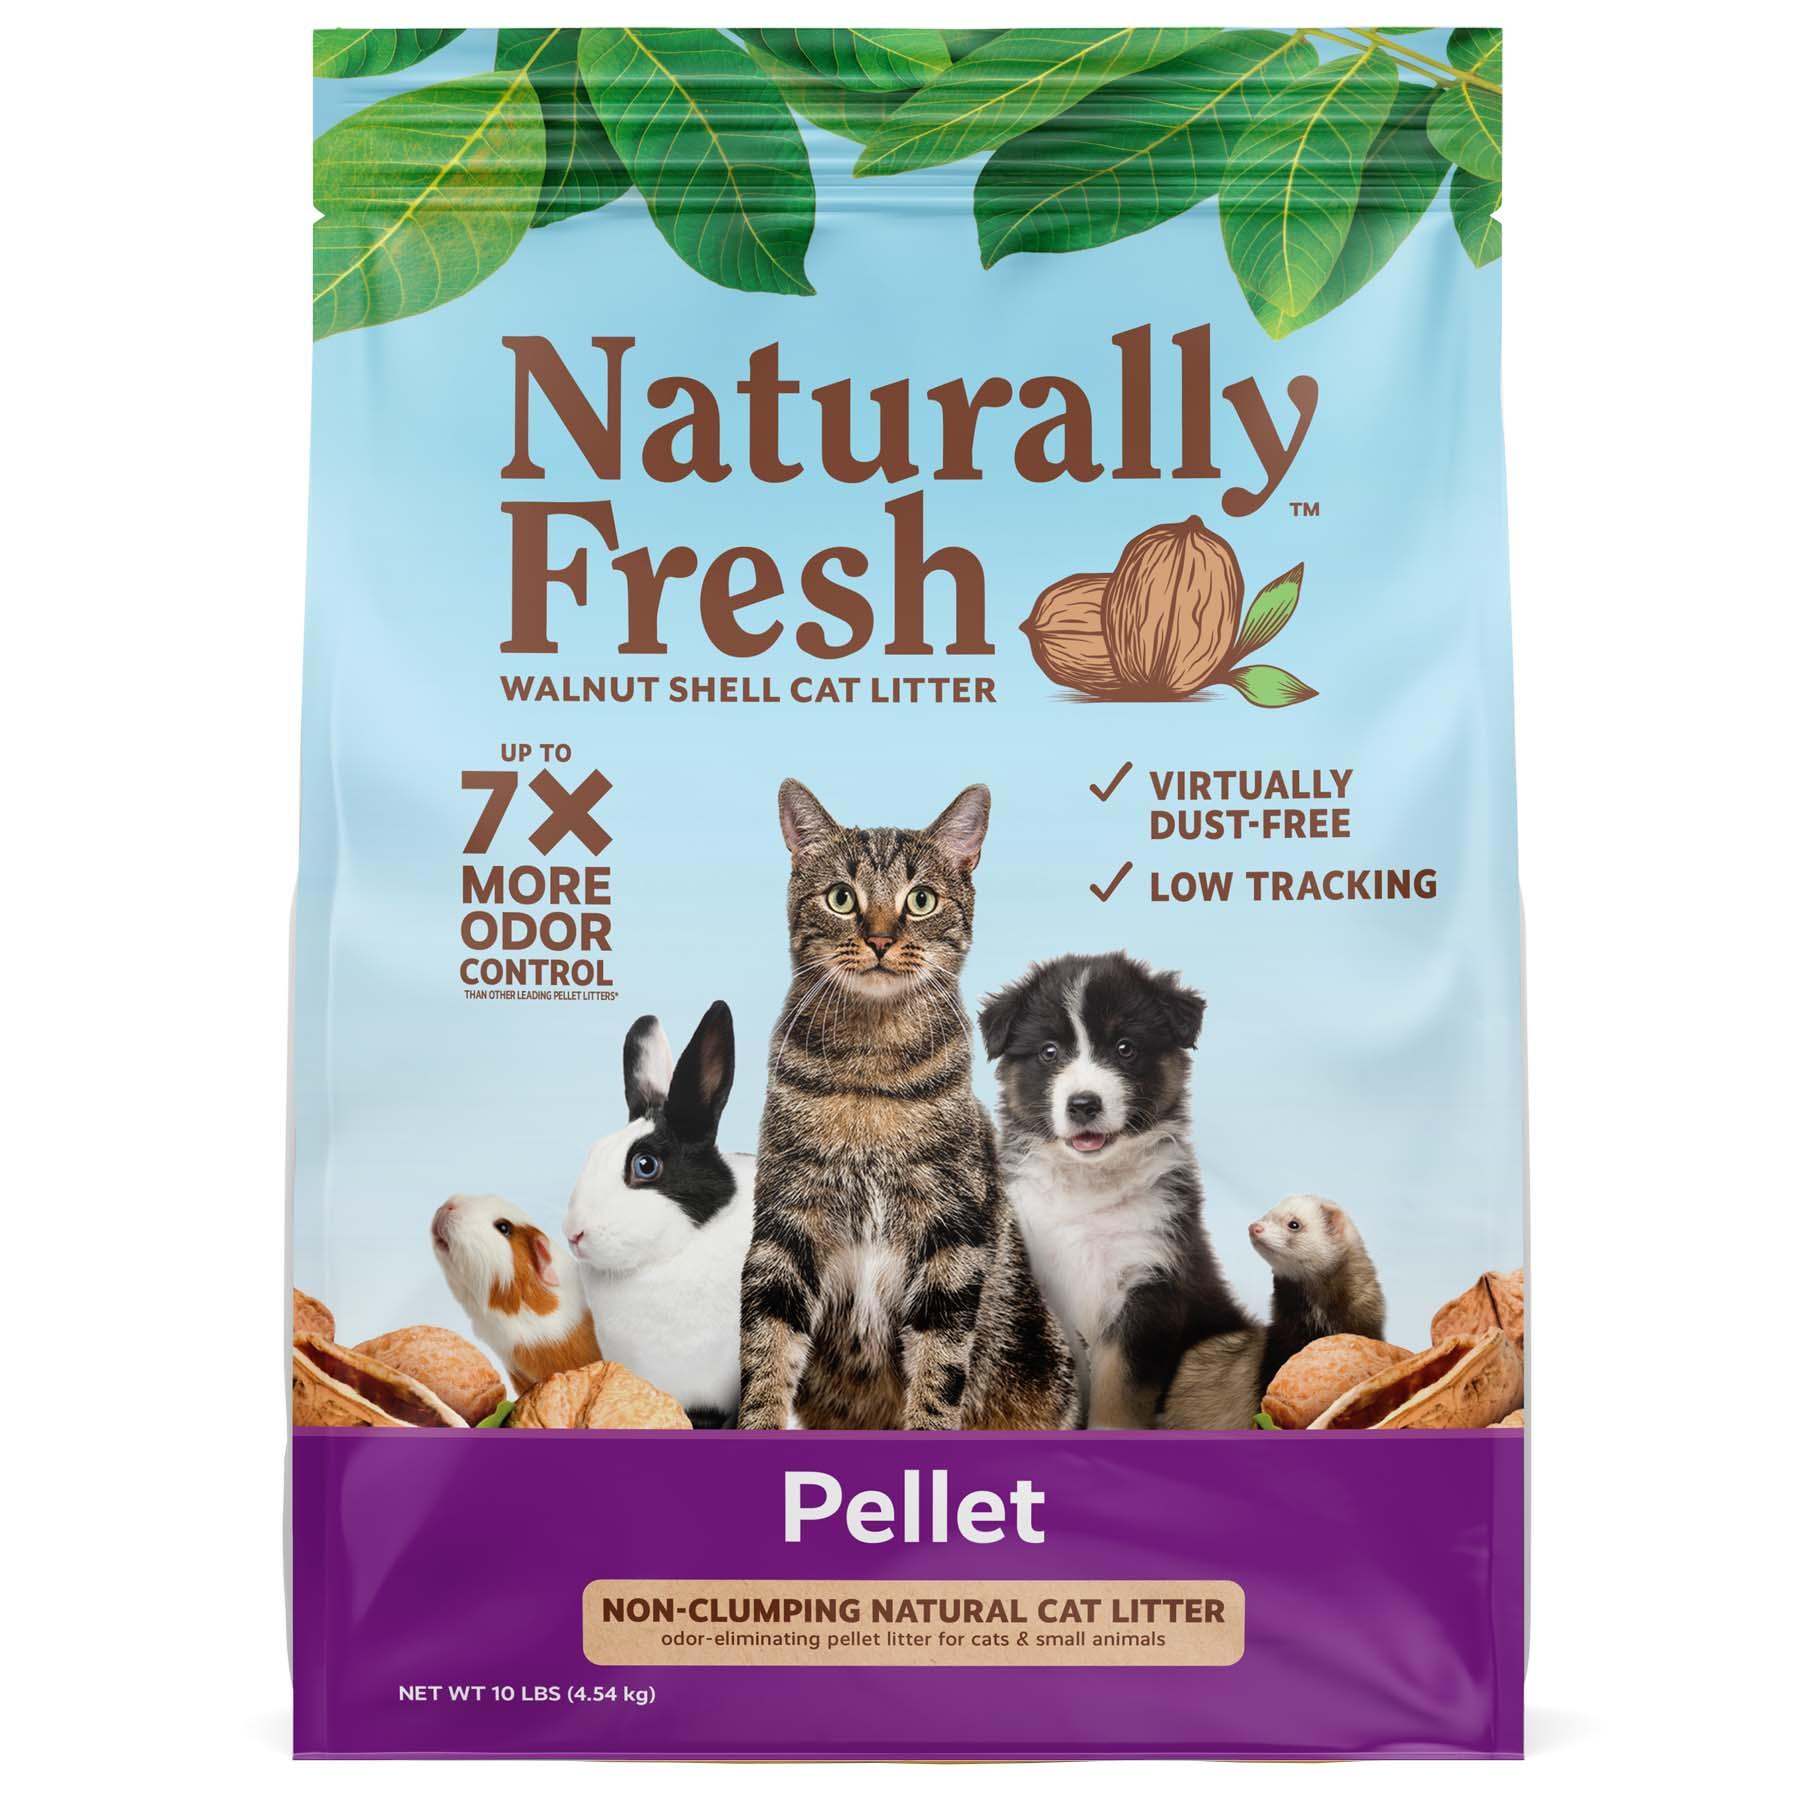 Naturally Fresh Walnut-Based Pellet Non-Clumping Cat Litter, 10-lb bag